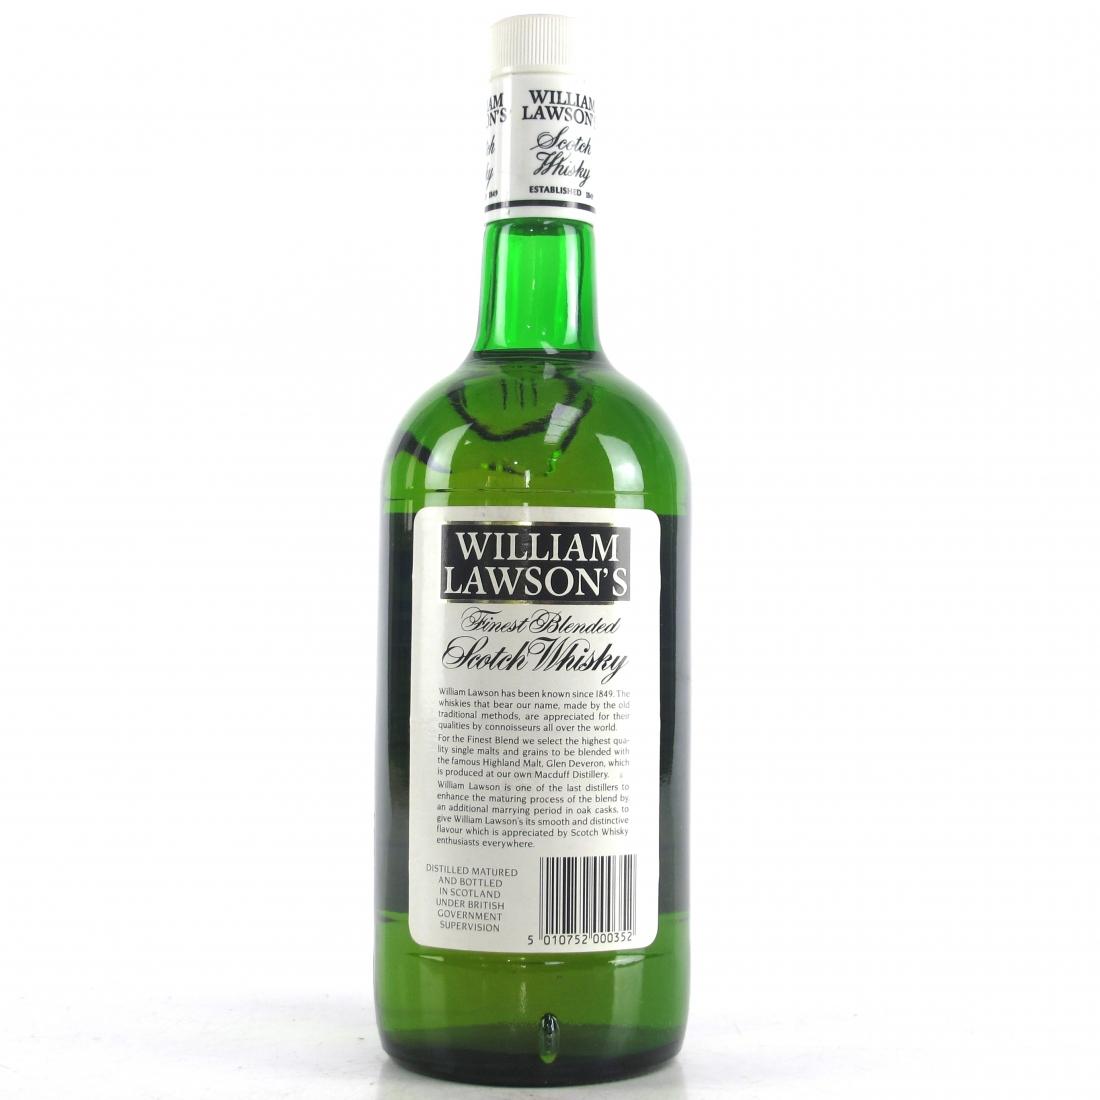 William Lawson's Finest Scotch Whisky